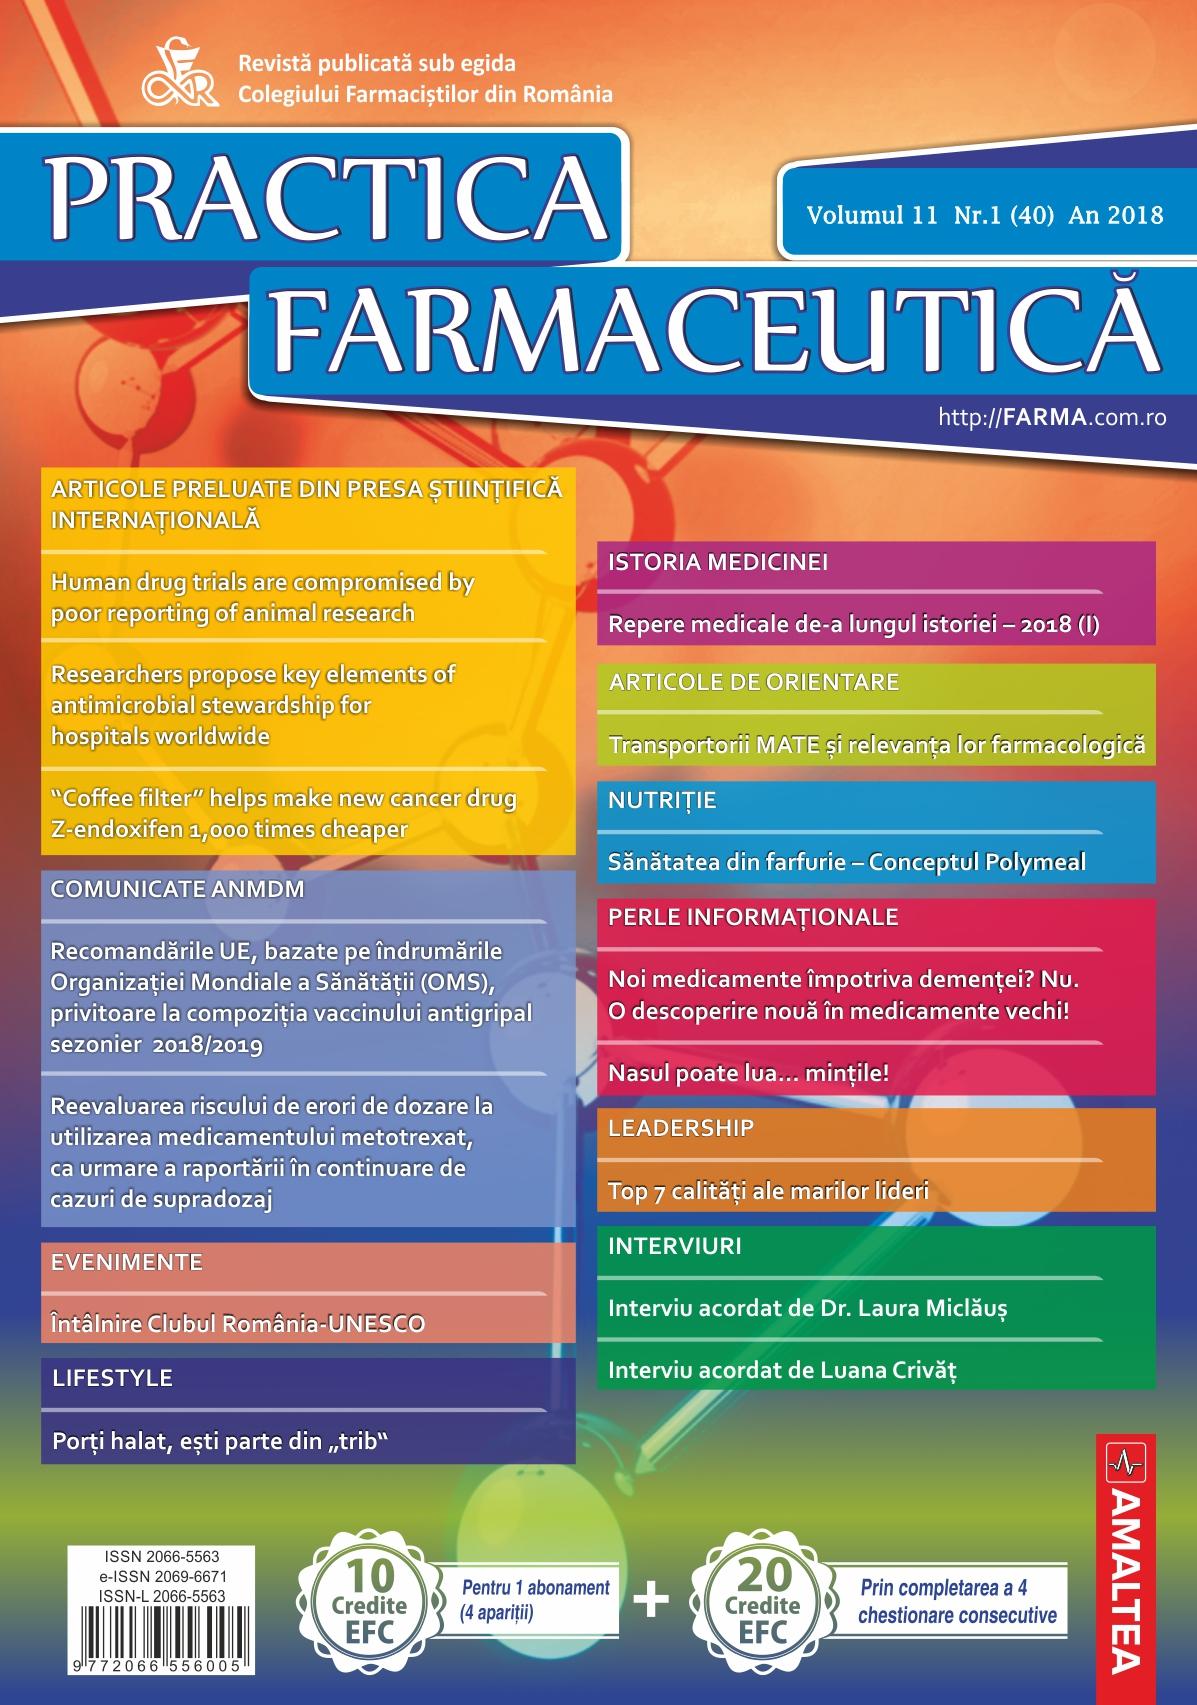 Revista Practica Farmaceutica, Vol. 11, Nr. 1 (40), 2018